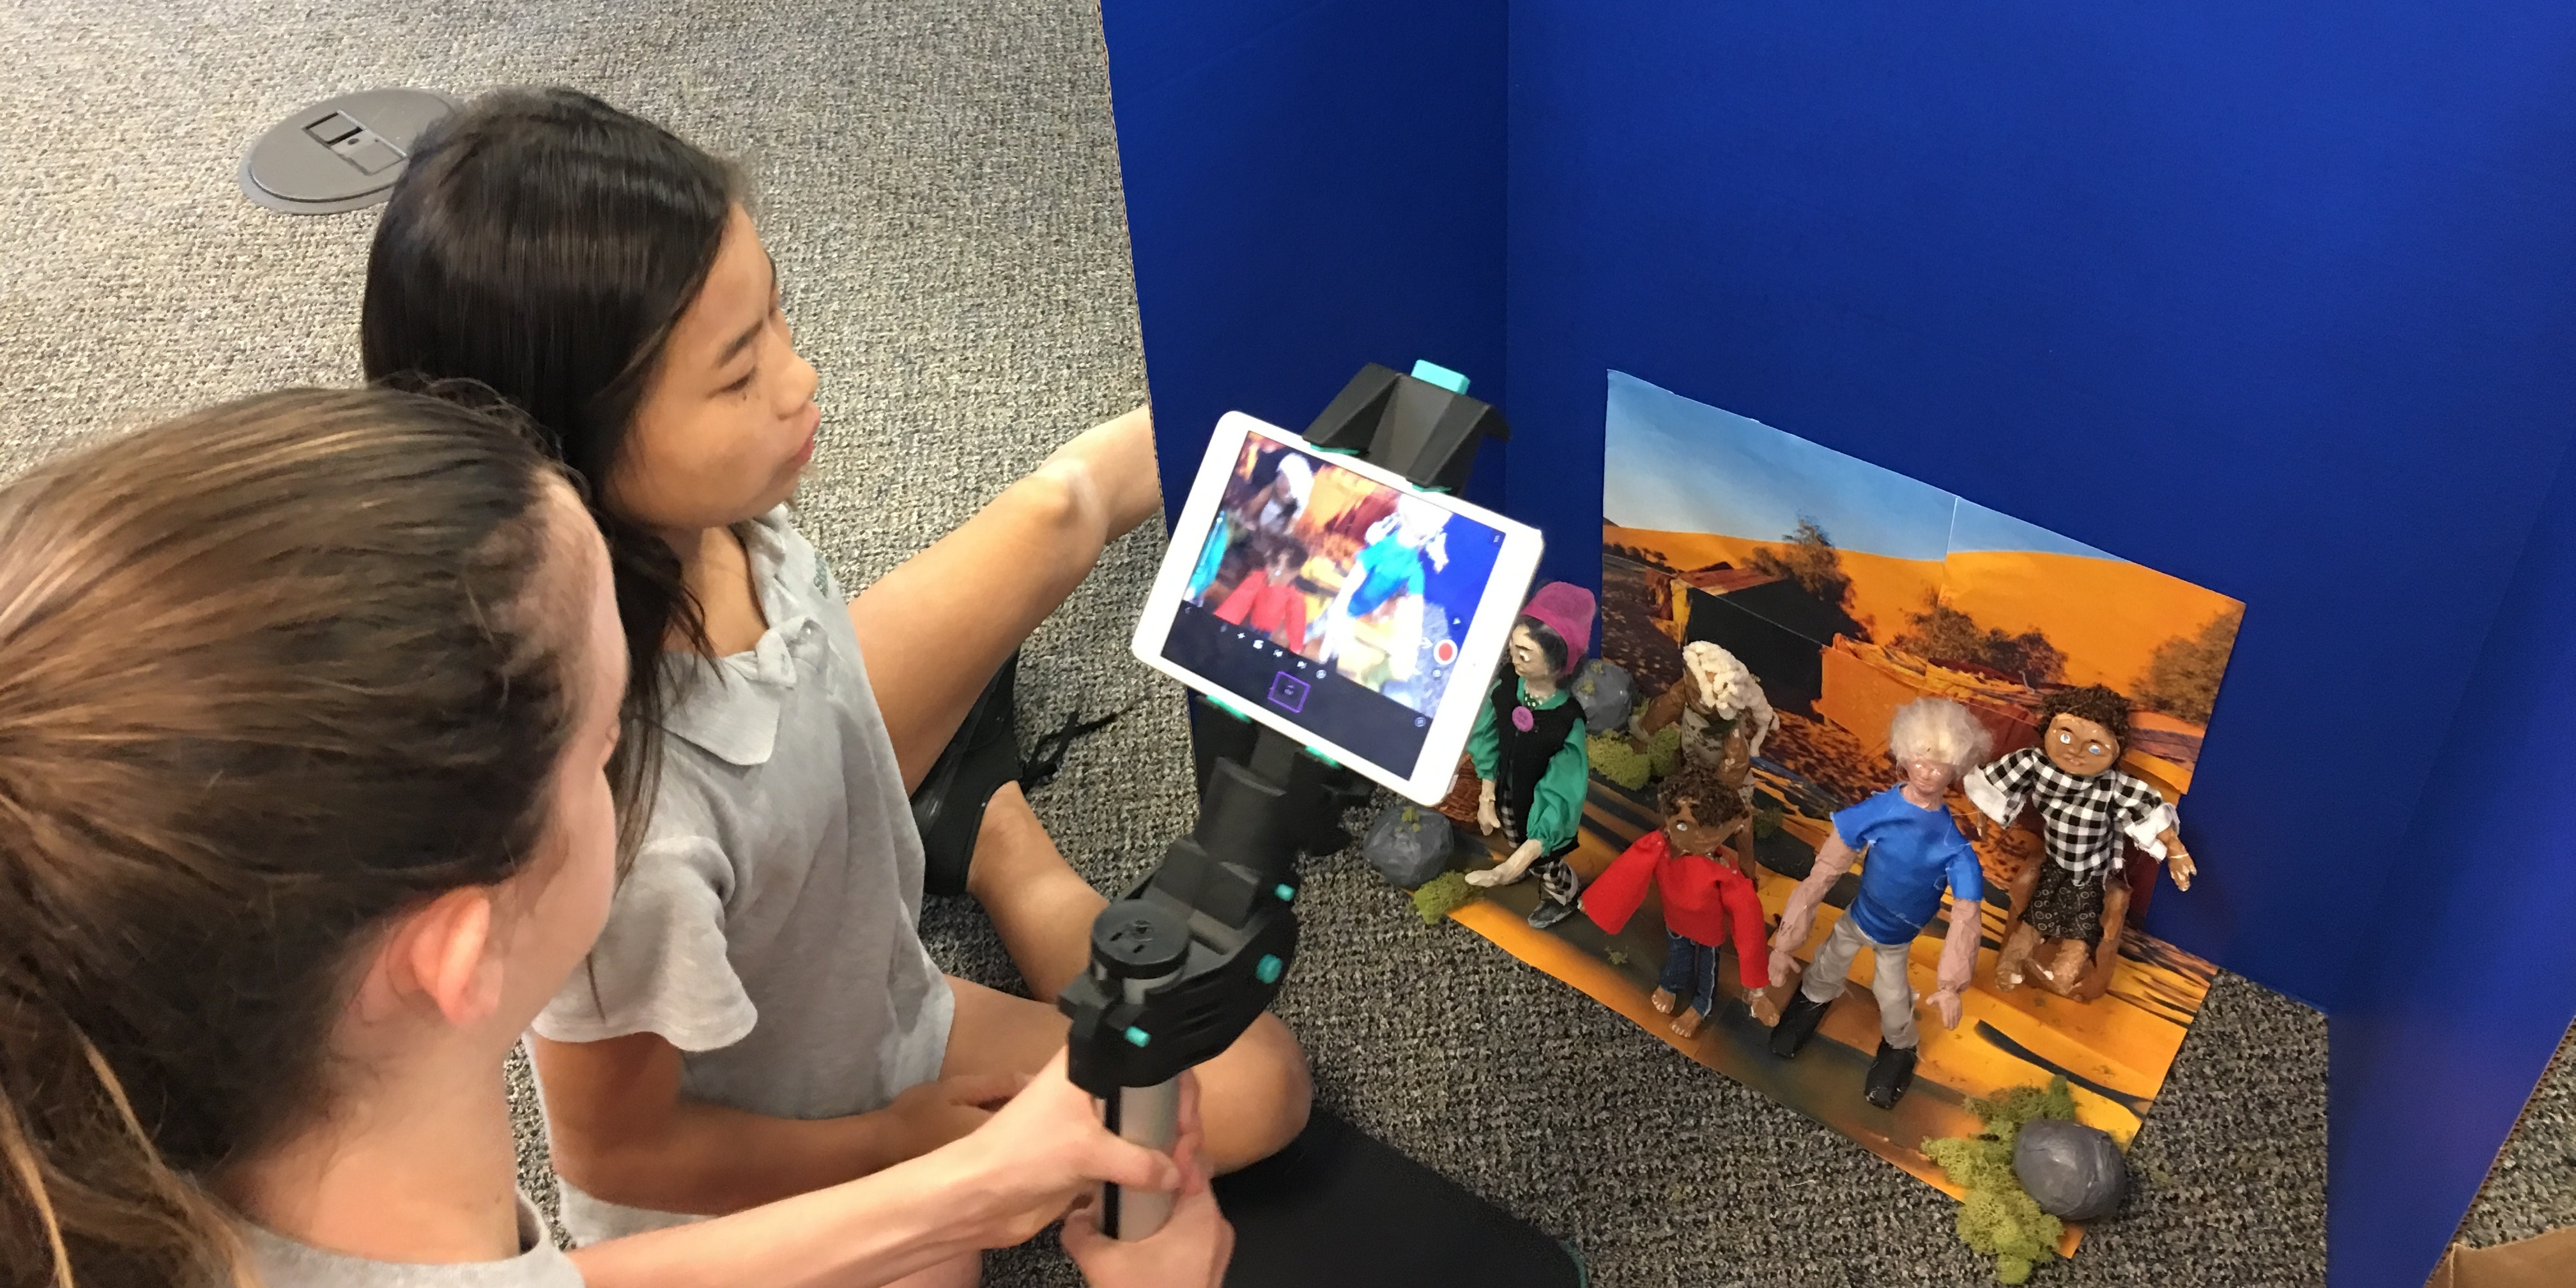 Middle School iPad program educational technology best practices